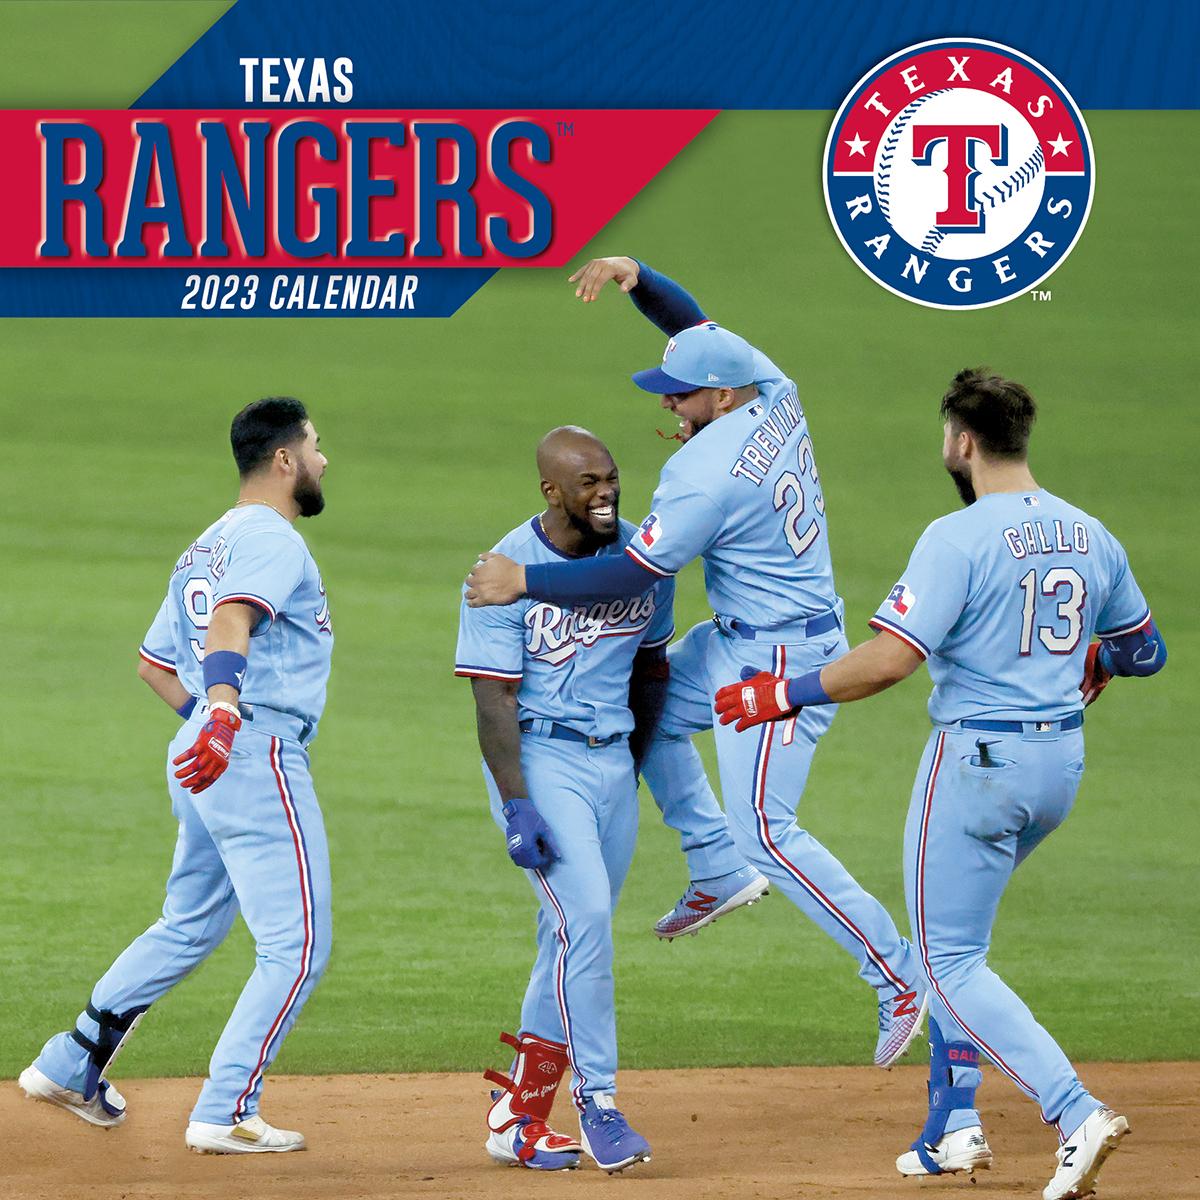 Texas Rangers 2019 Wall Calendar Buy At Khc Sports